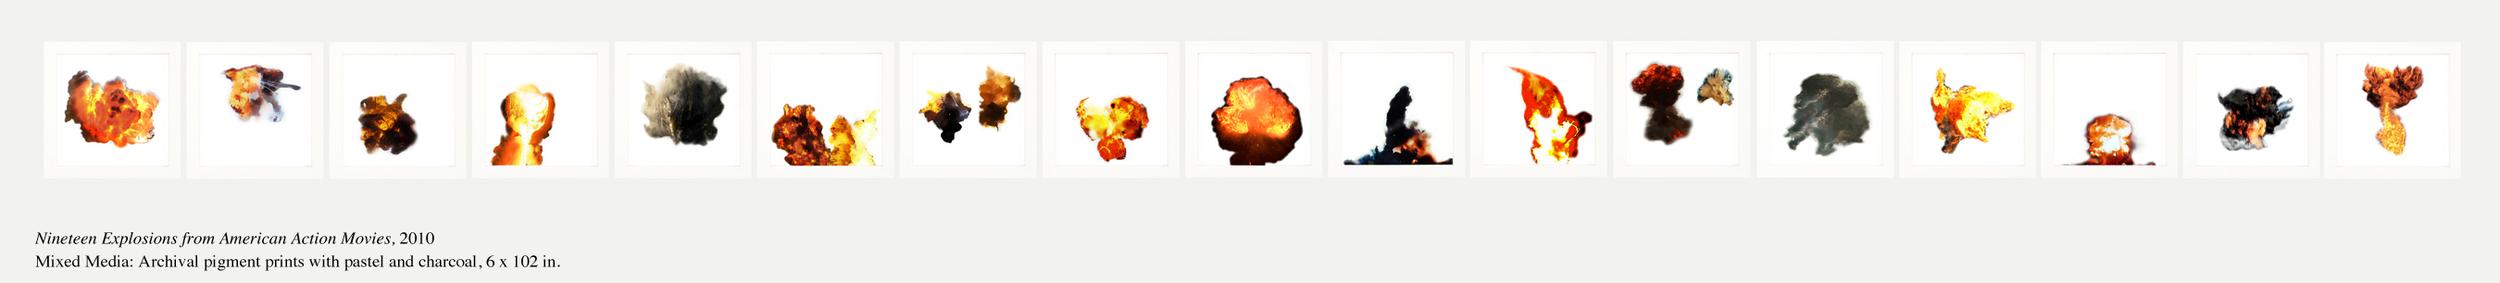 Nineteen Explosions for website.jpg